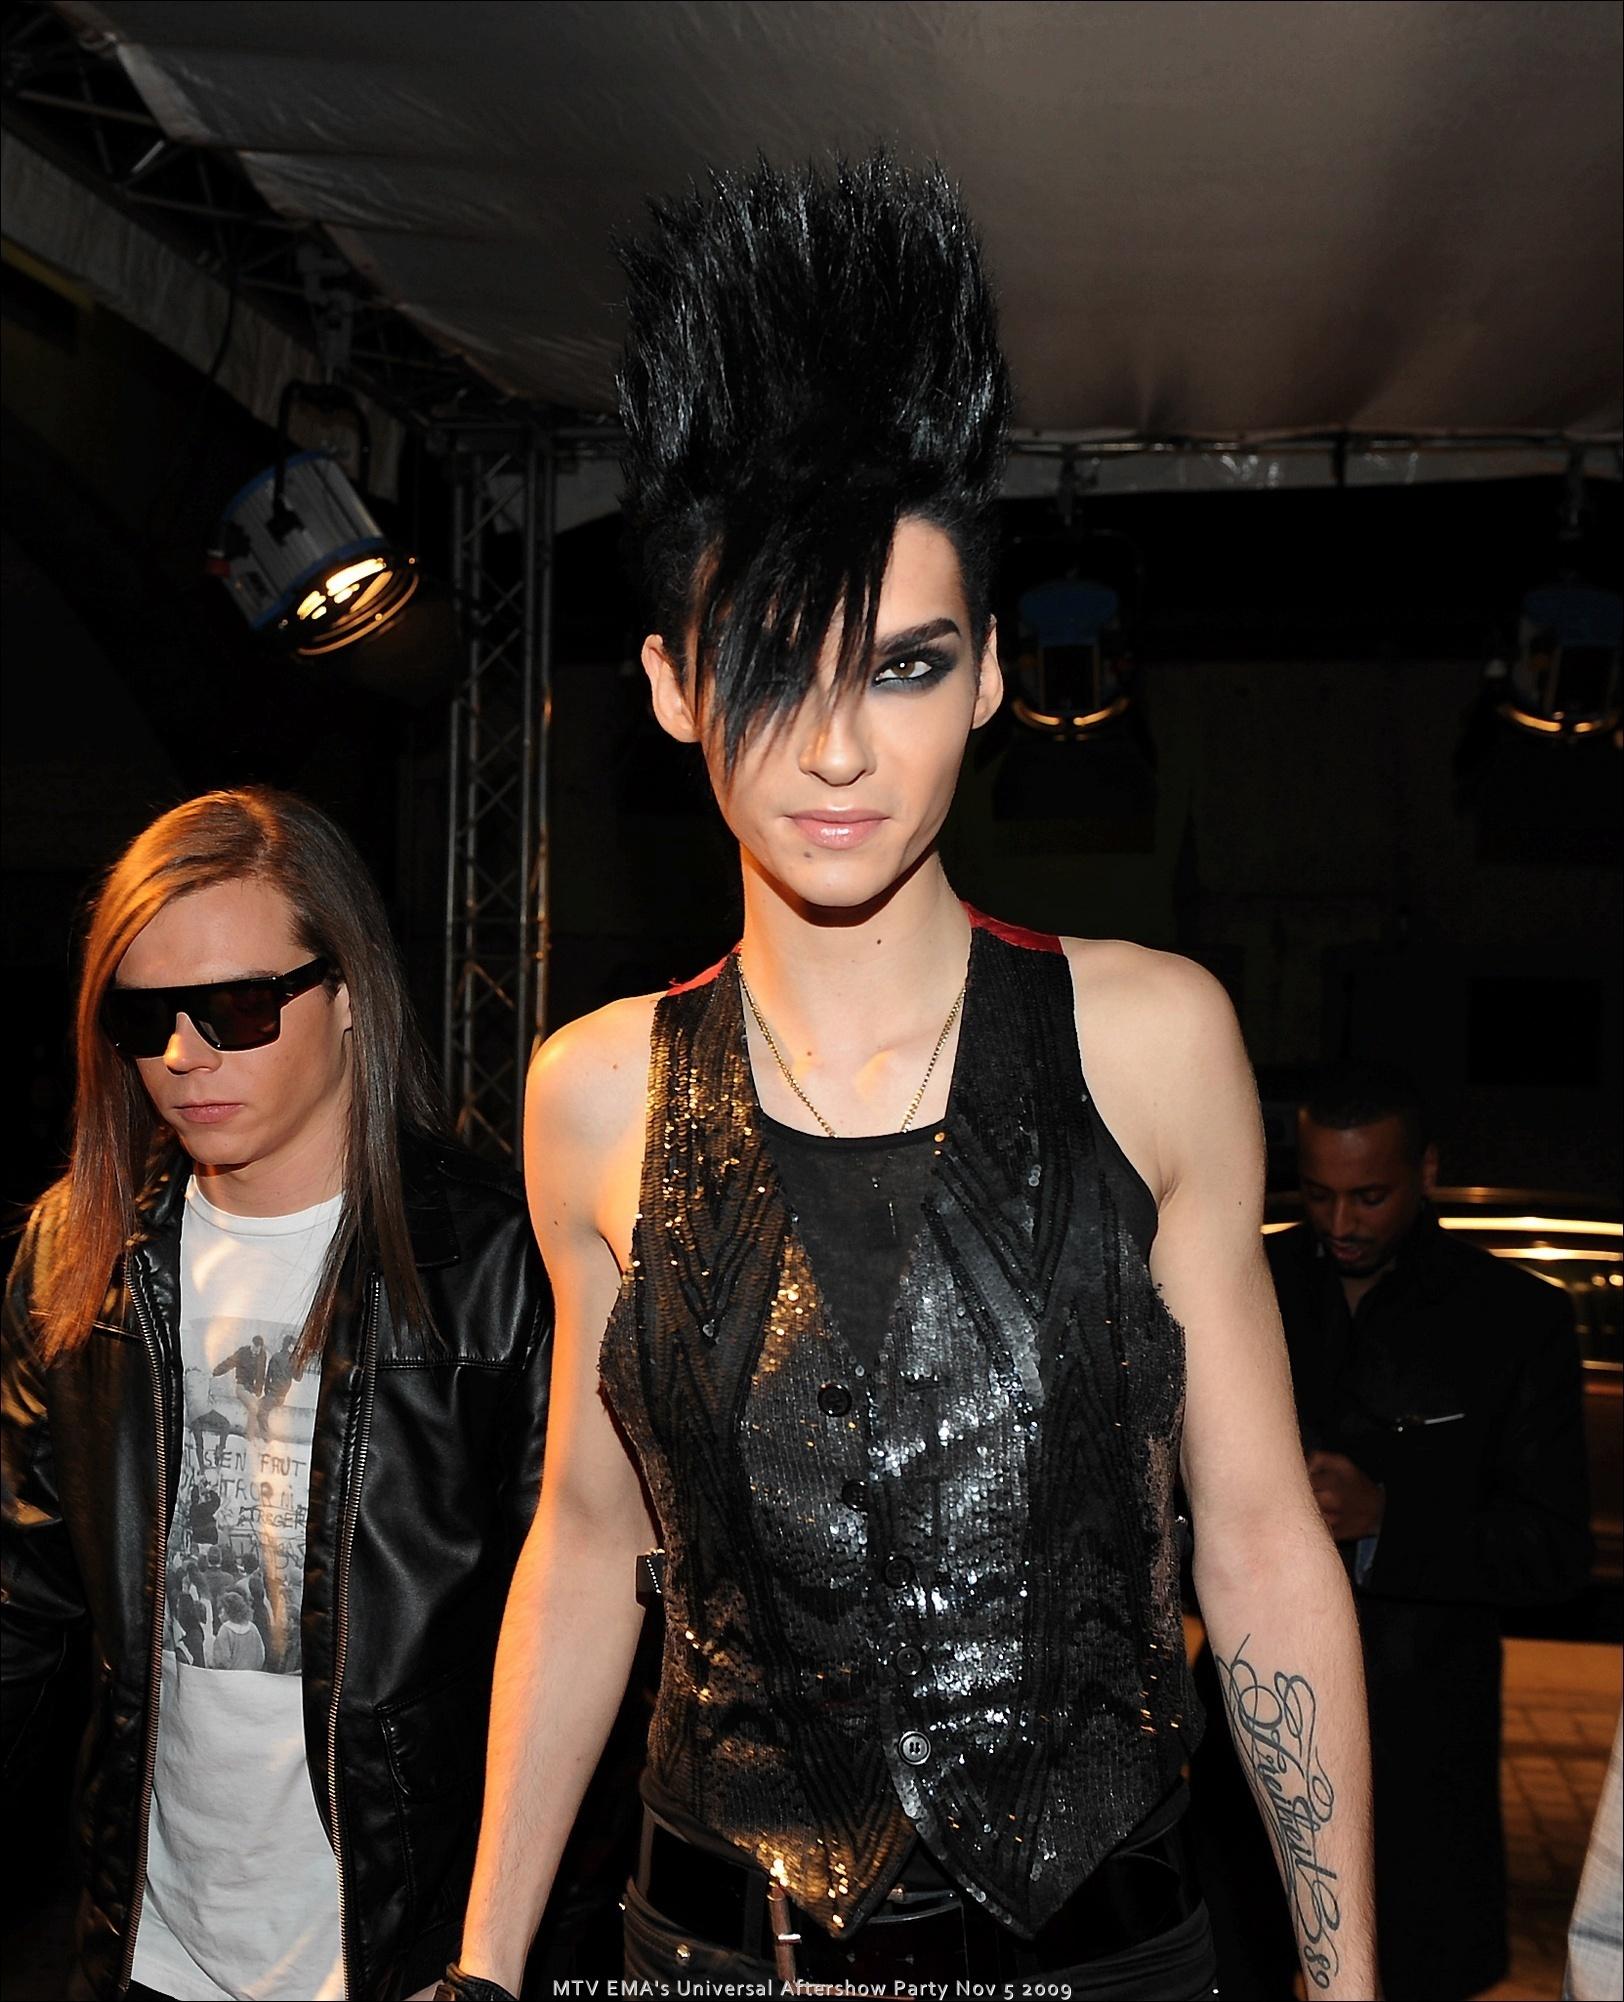 Tokio Hotel tokio hotel Facebook Comment Photo Download